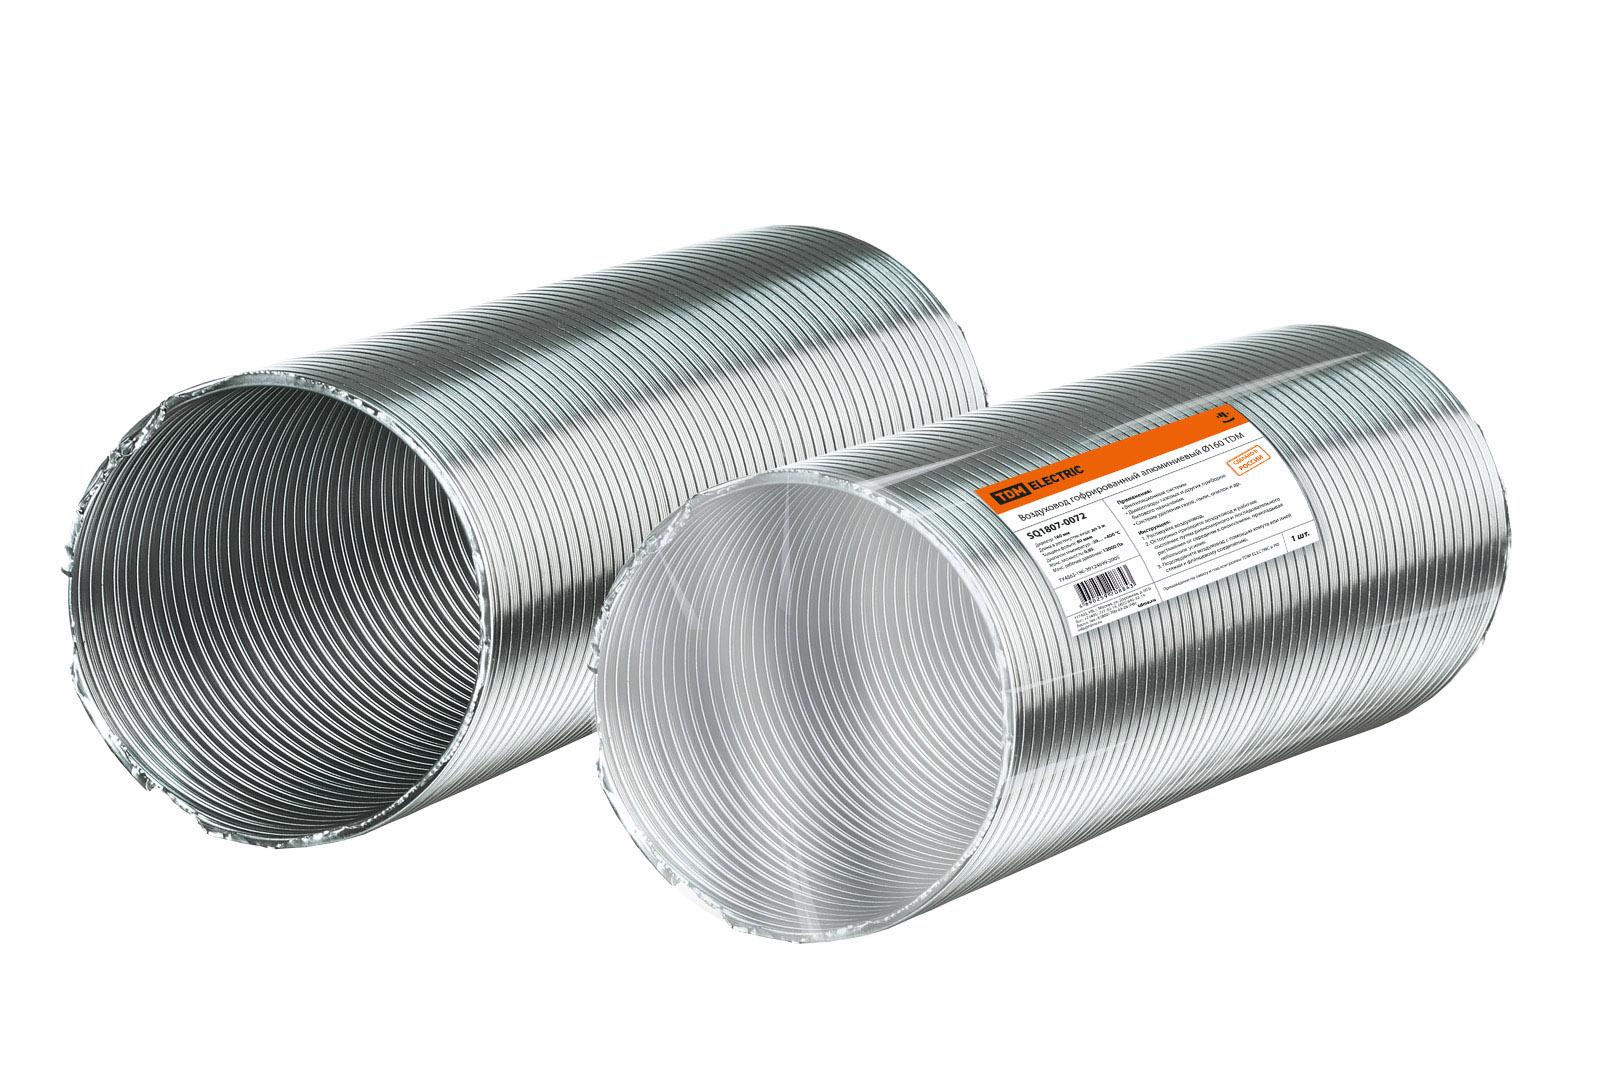 Воздуховод ТДМВоздуховоды (климат)<br>Тип: воздуховод,<br>Тип воздуховода: гибкий,<br>Материал: алюминий,<br>Форма: круглая,<br>Диаметр: 160,<br>Мин. длина: 0.6,<br>Макс. длина: 3<br>